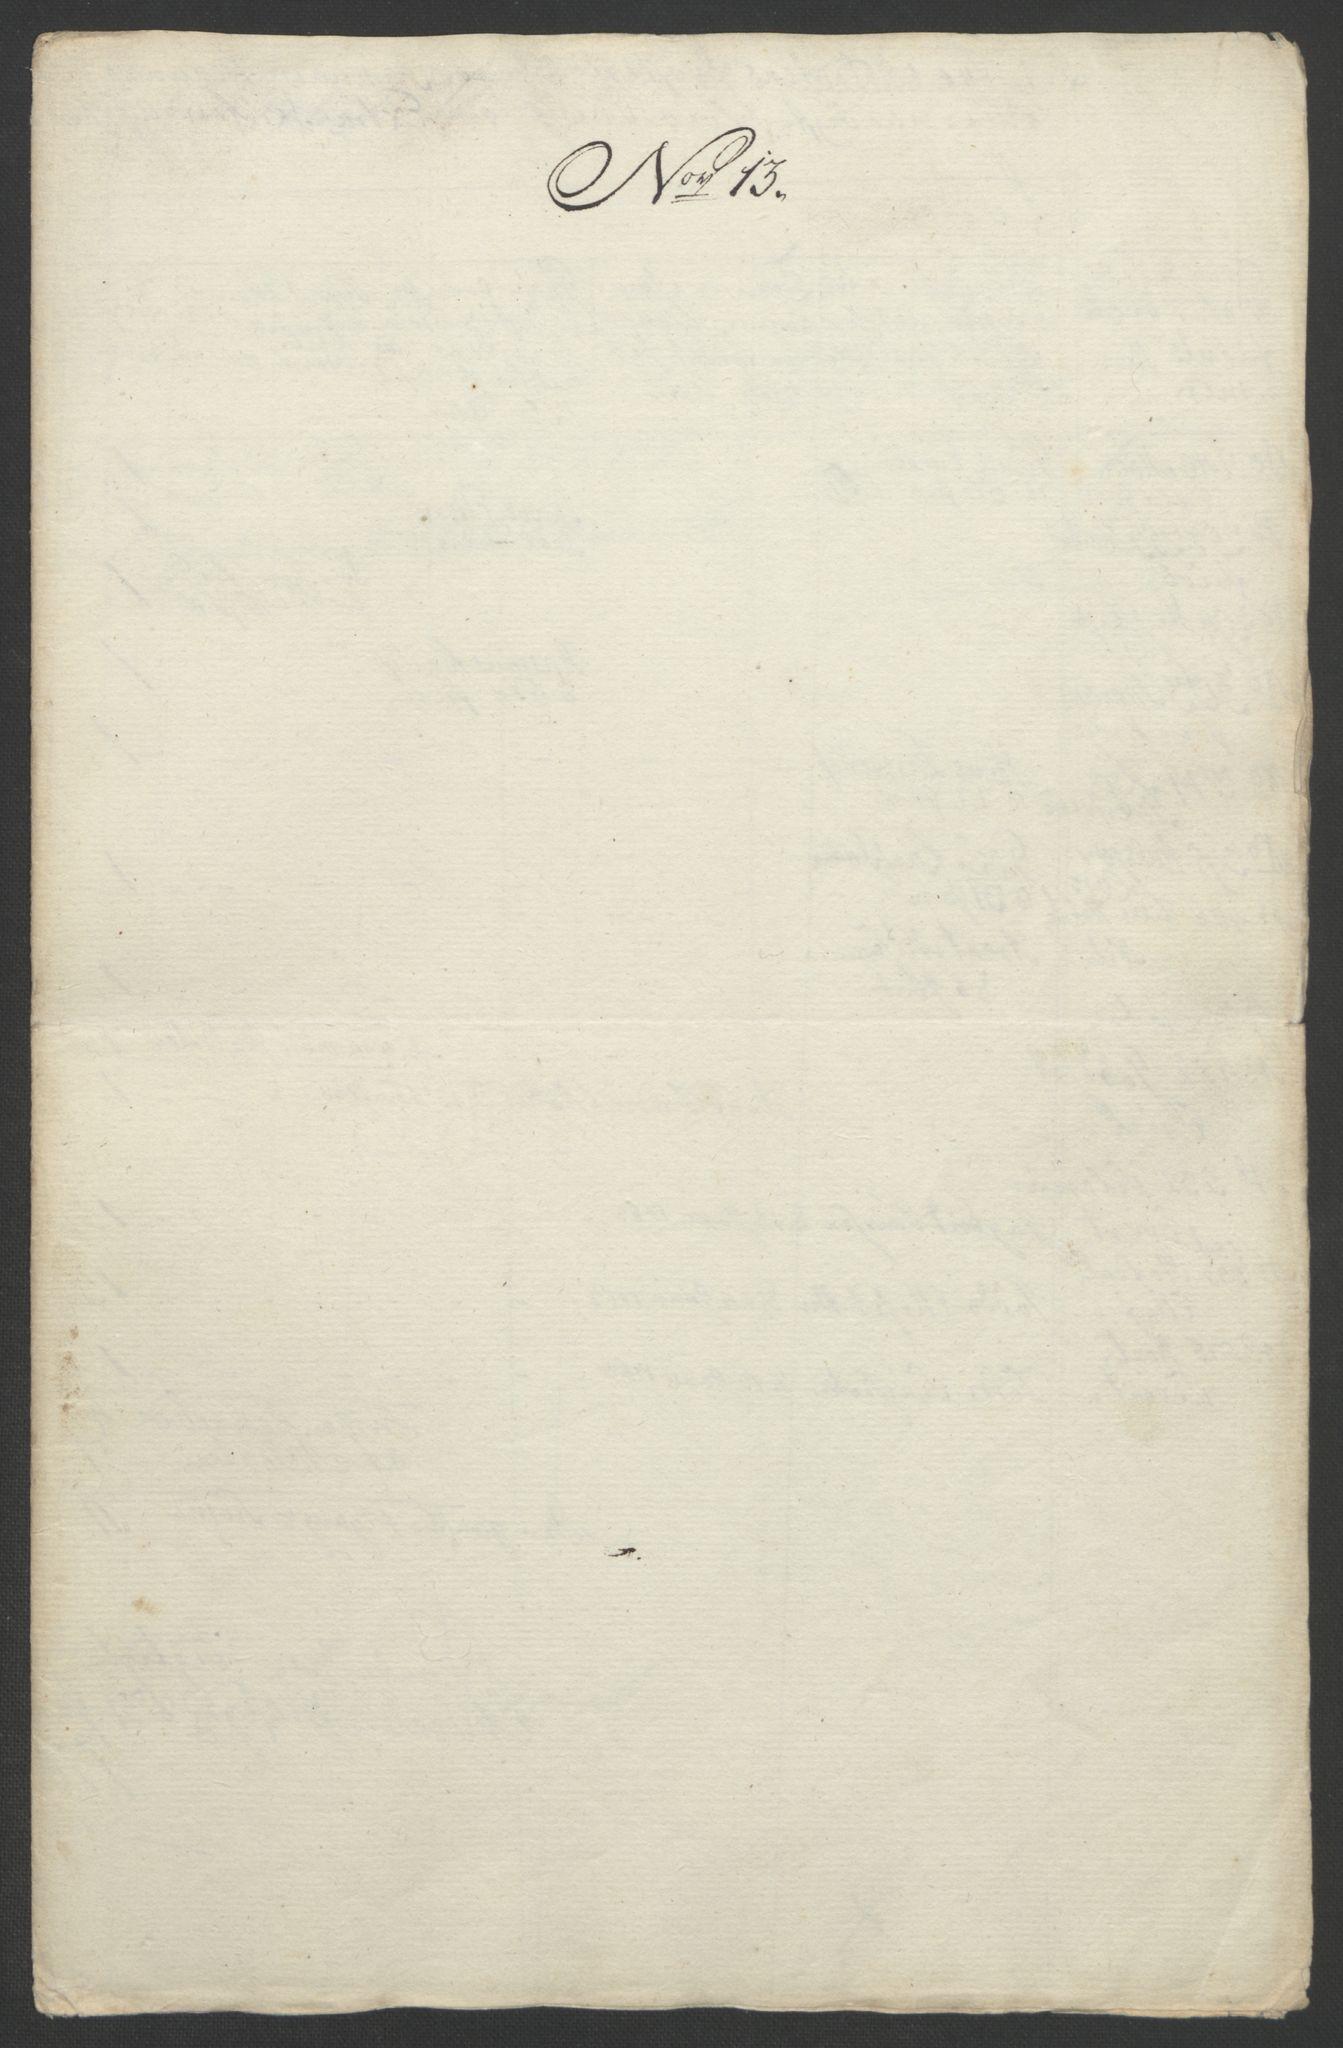 RA, Rentekammeret inntil 1814, Realistisk ordnet avdeling, Ol/L0021: [Gg 10]: Ekstraskatten, 23.09.1762. Orkdal og Gauldal, 1762-1767, s. 264